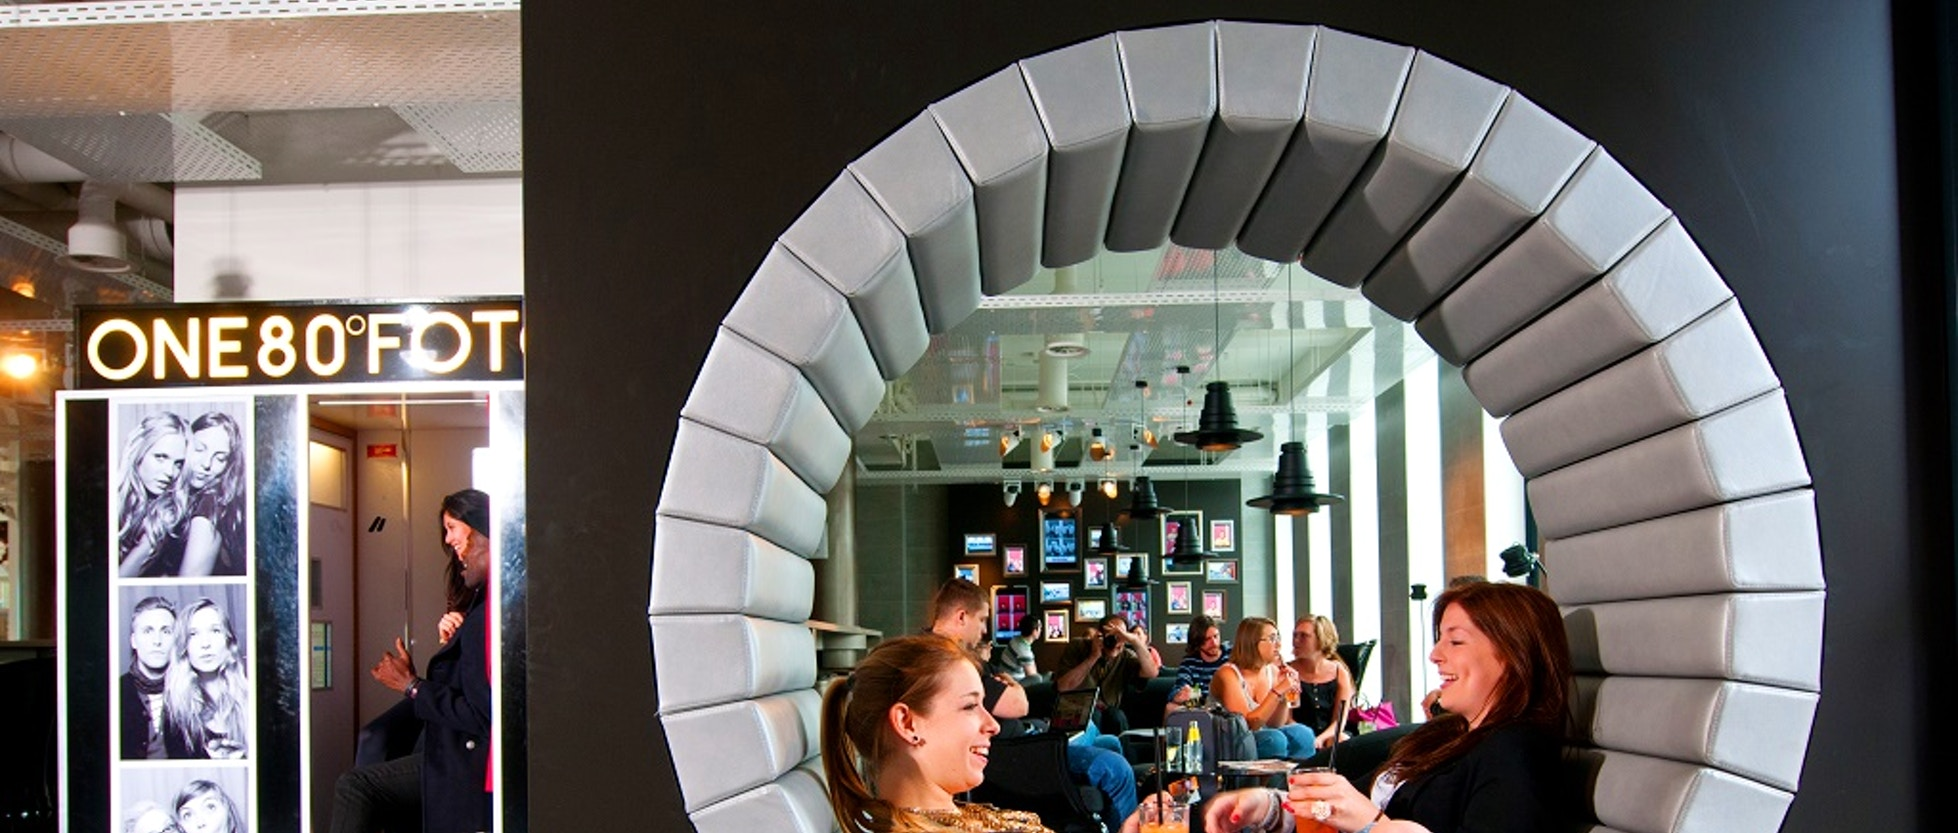 Guida ai migliori ostelli di Berlino | VIVI Berlino